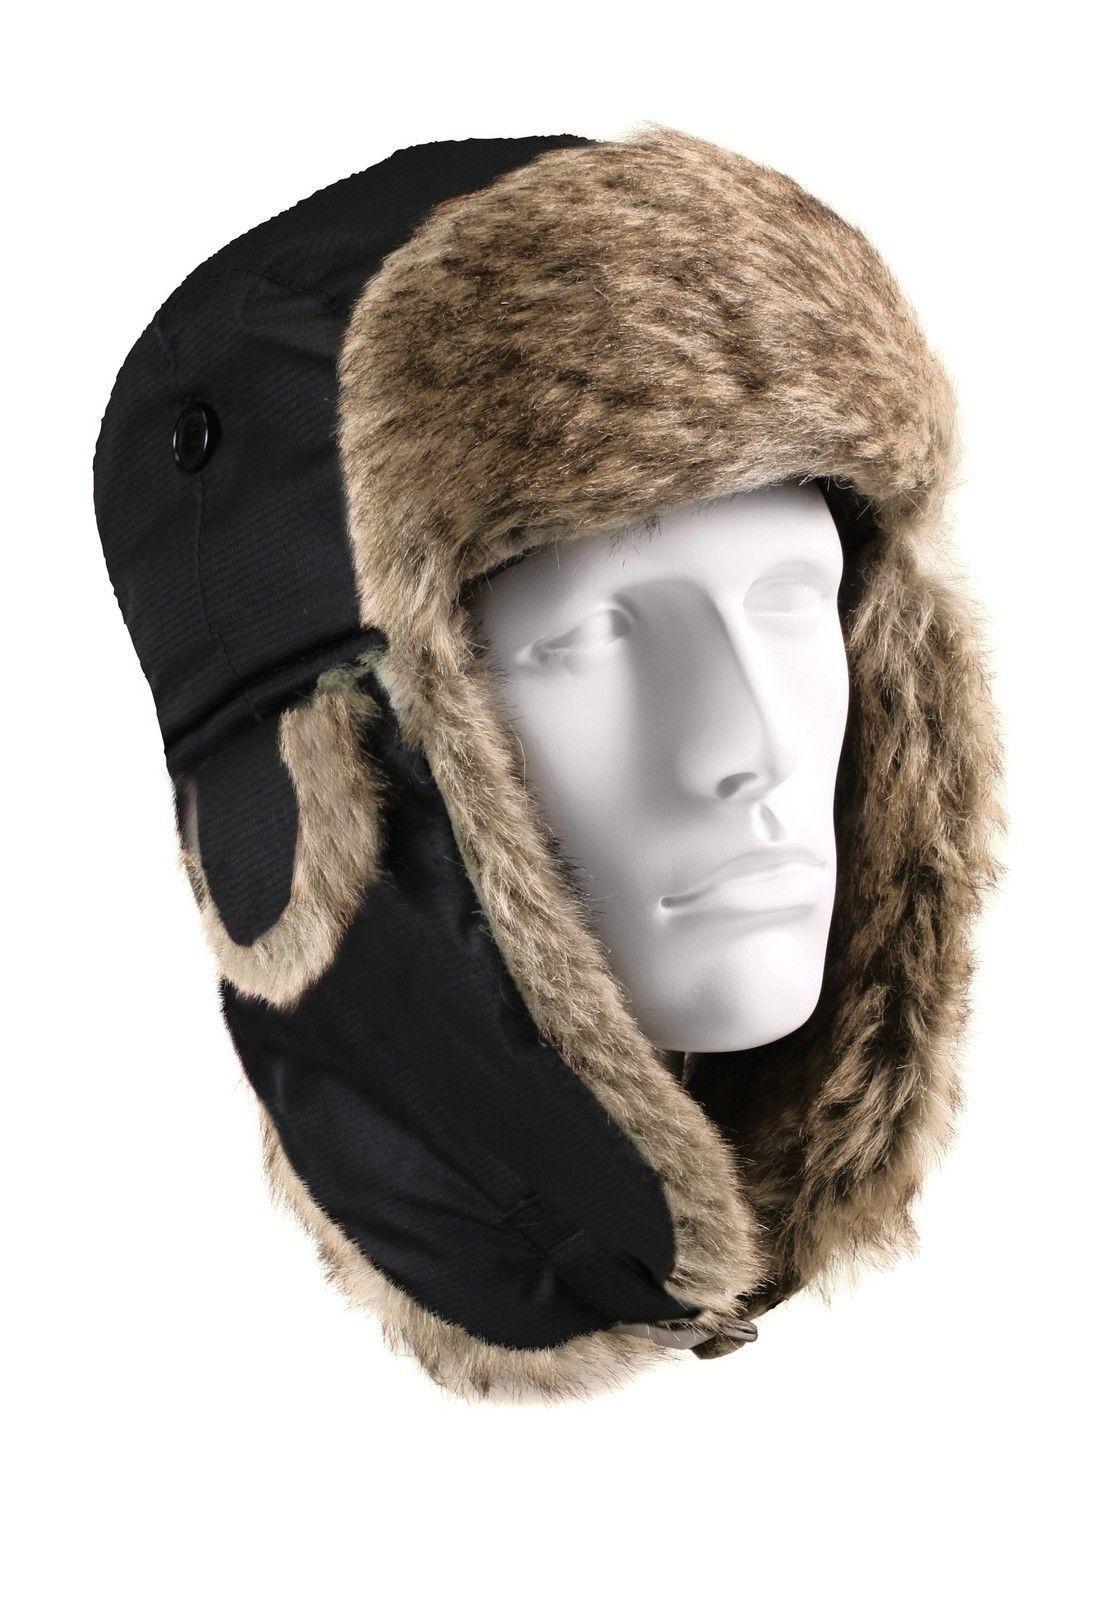 74092f79 Winter Fur Flyers Hat w/ Earflaps Warm Camo Plaid Cold Weather Cap Hats  7-7.75